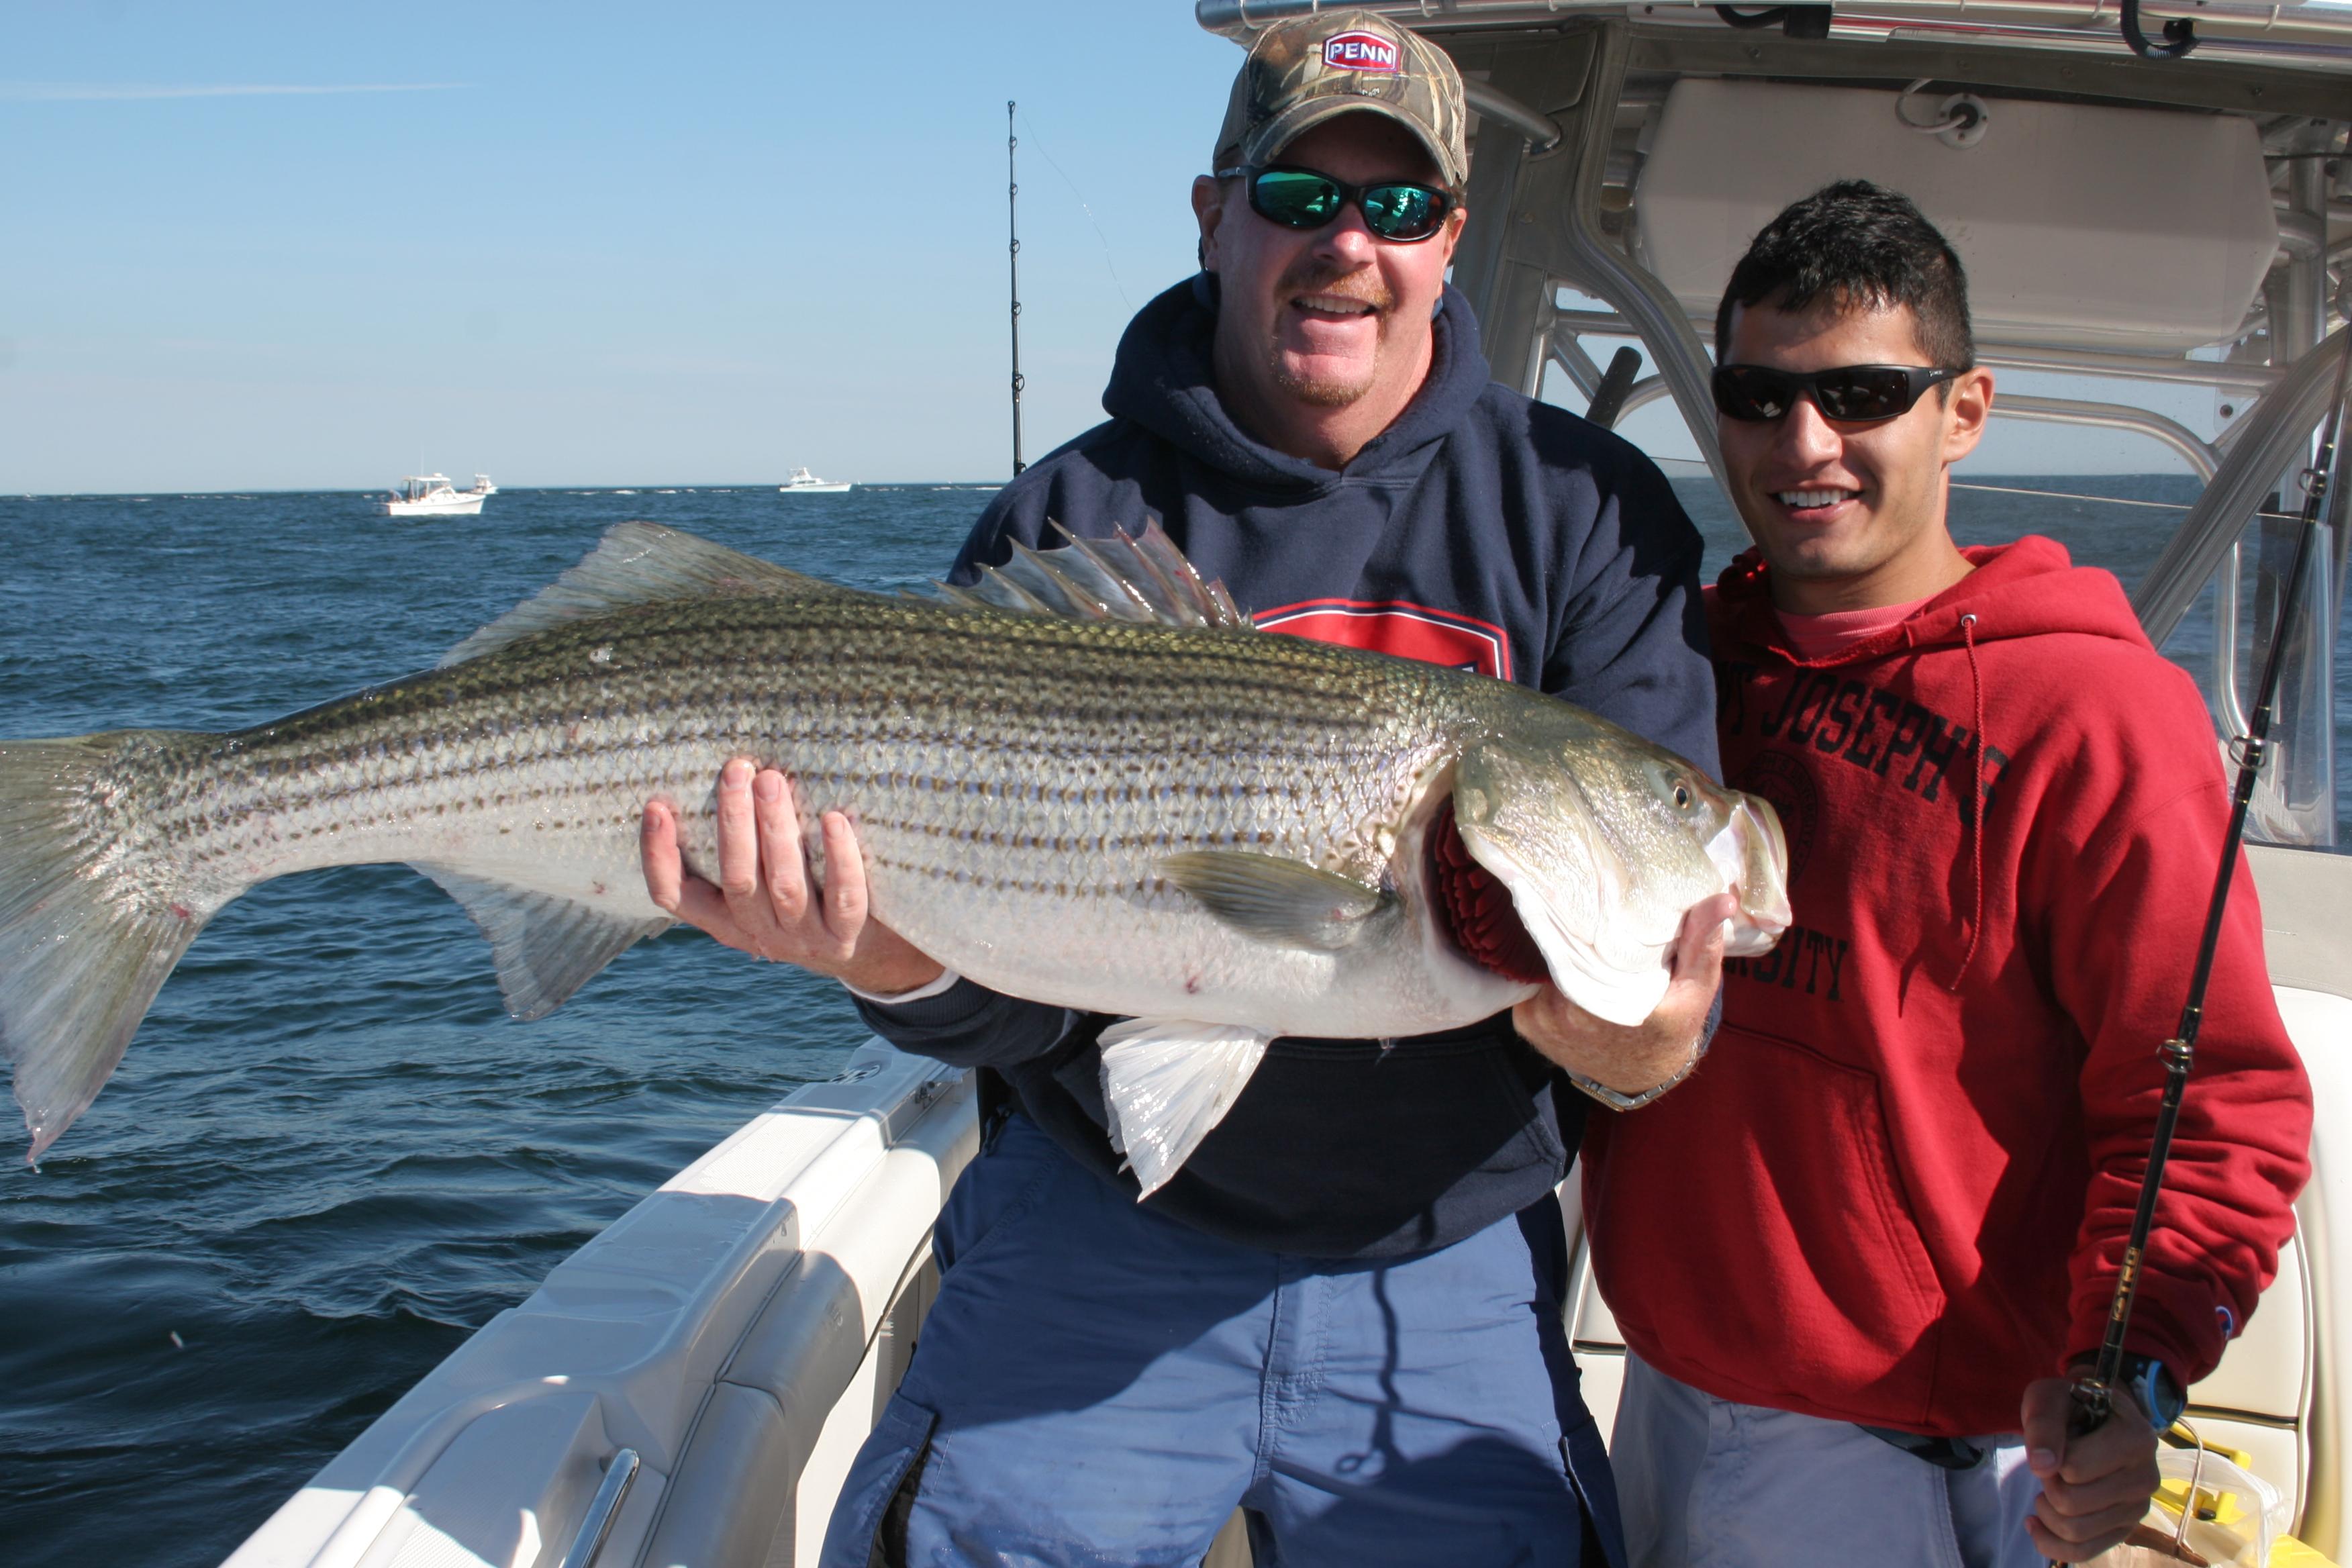 Atlantic highlands fishing report nj stripers and for Atlantic highlands fishing report